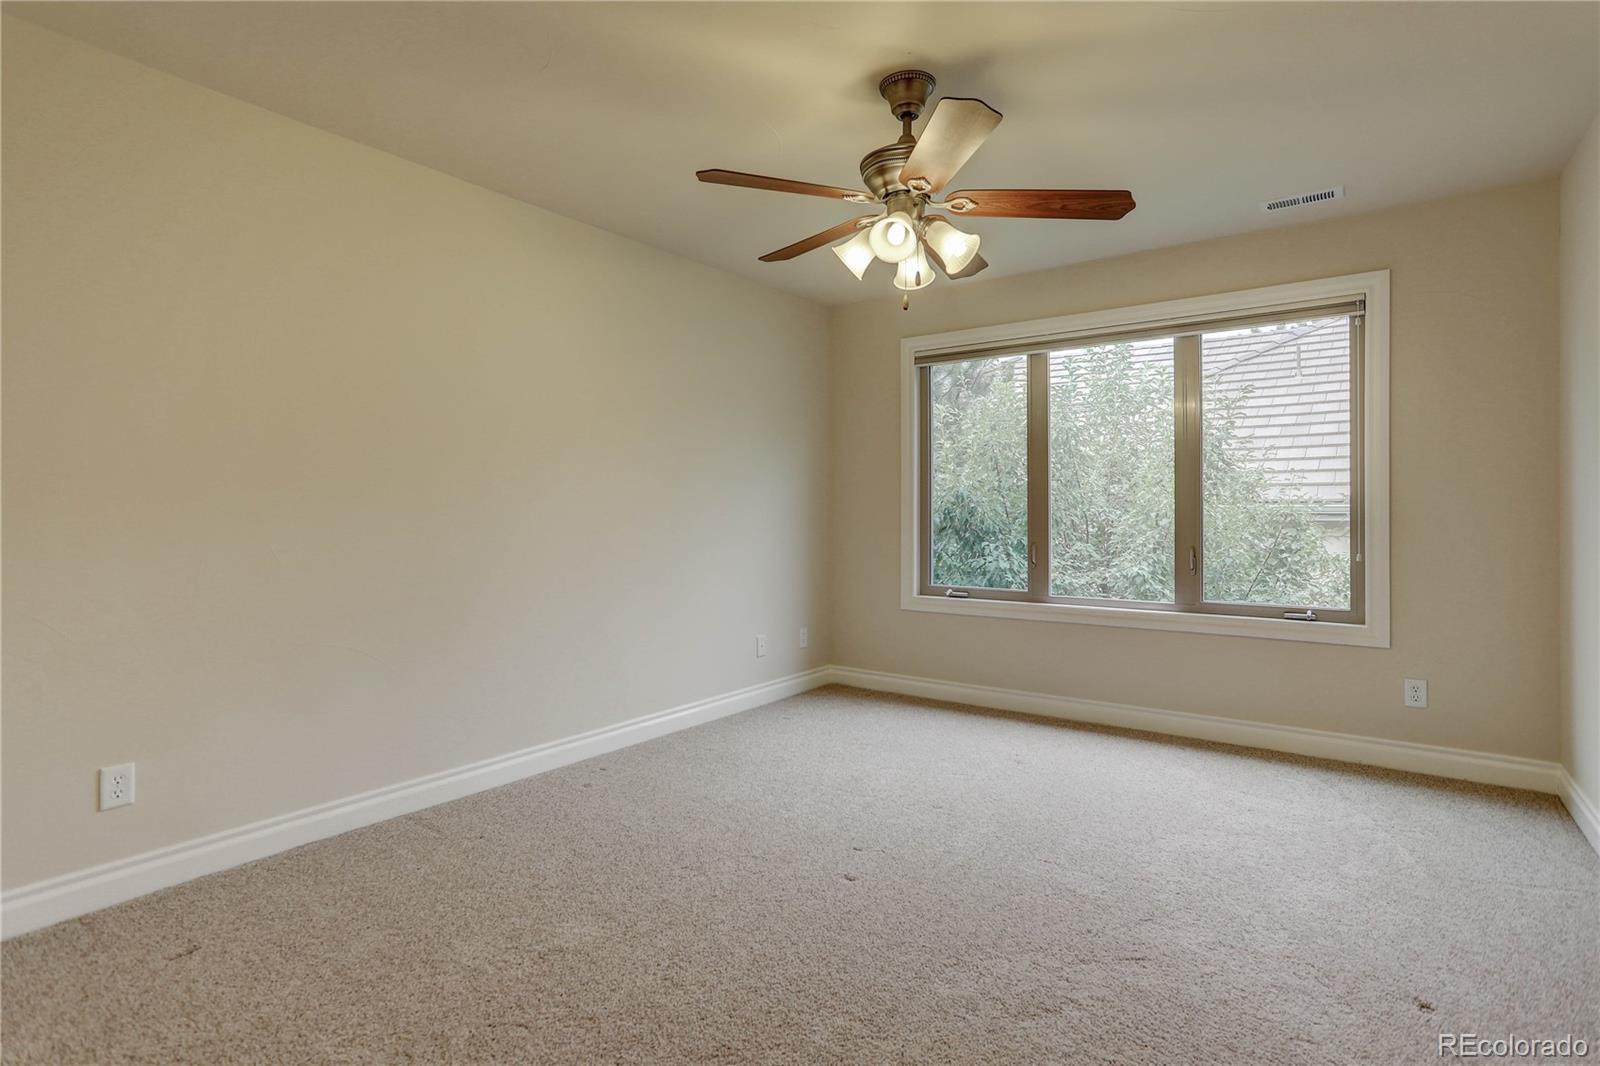 MLS# 3792653 - 1 - 40  Brookhaven Drive, Littleton, CO 80123